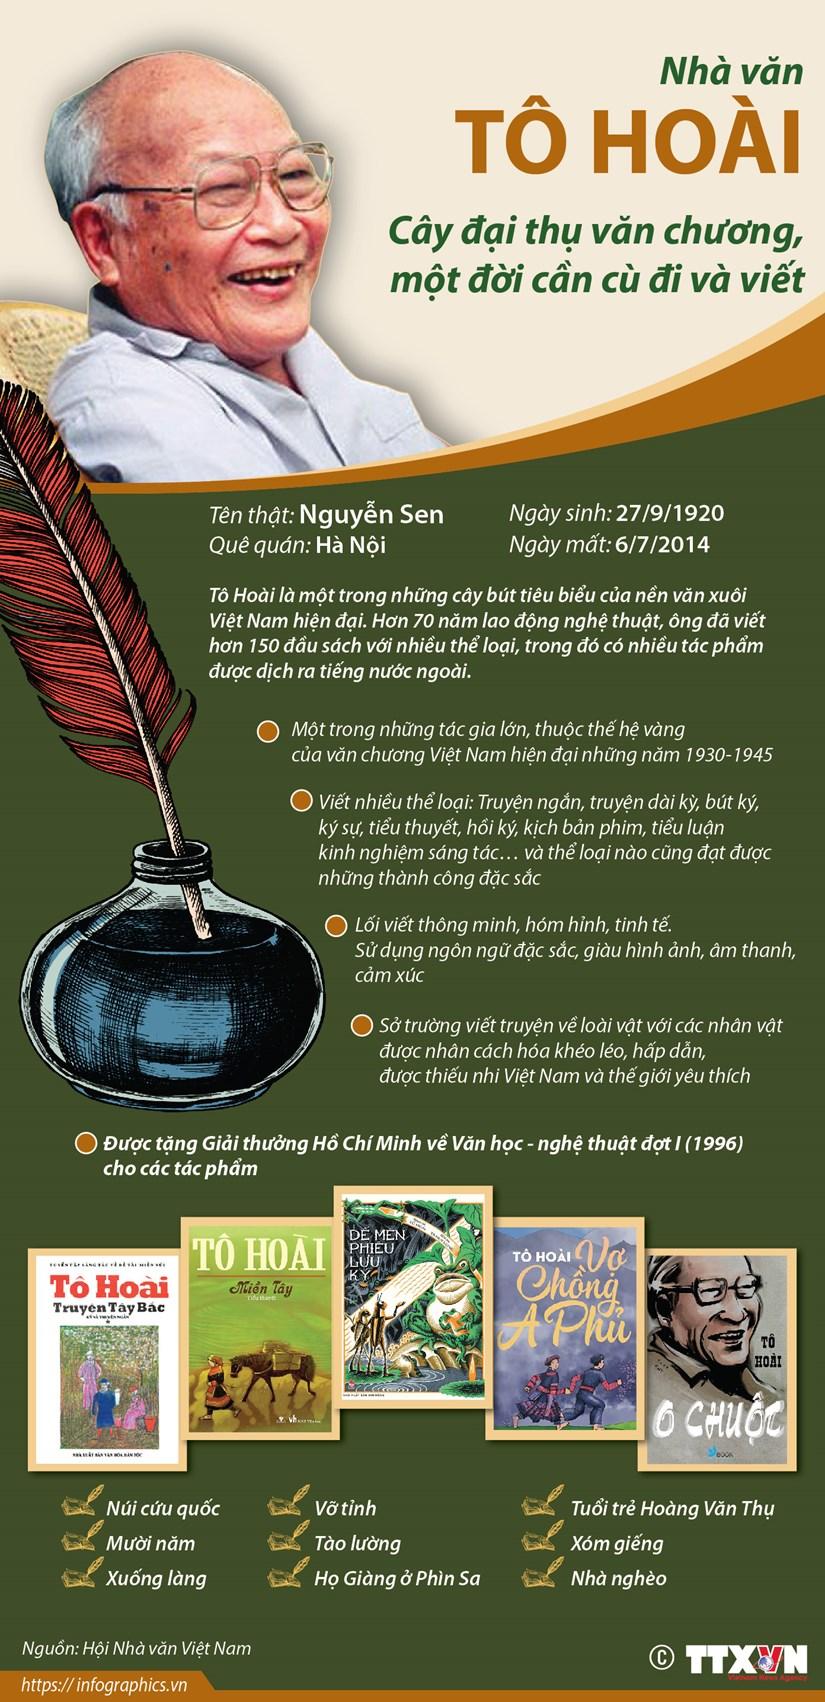 [Infographics] Nha van To Hoai - Cay dai thu van chuong cua Viet Nam hinh anh 1